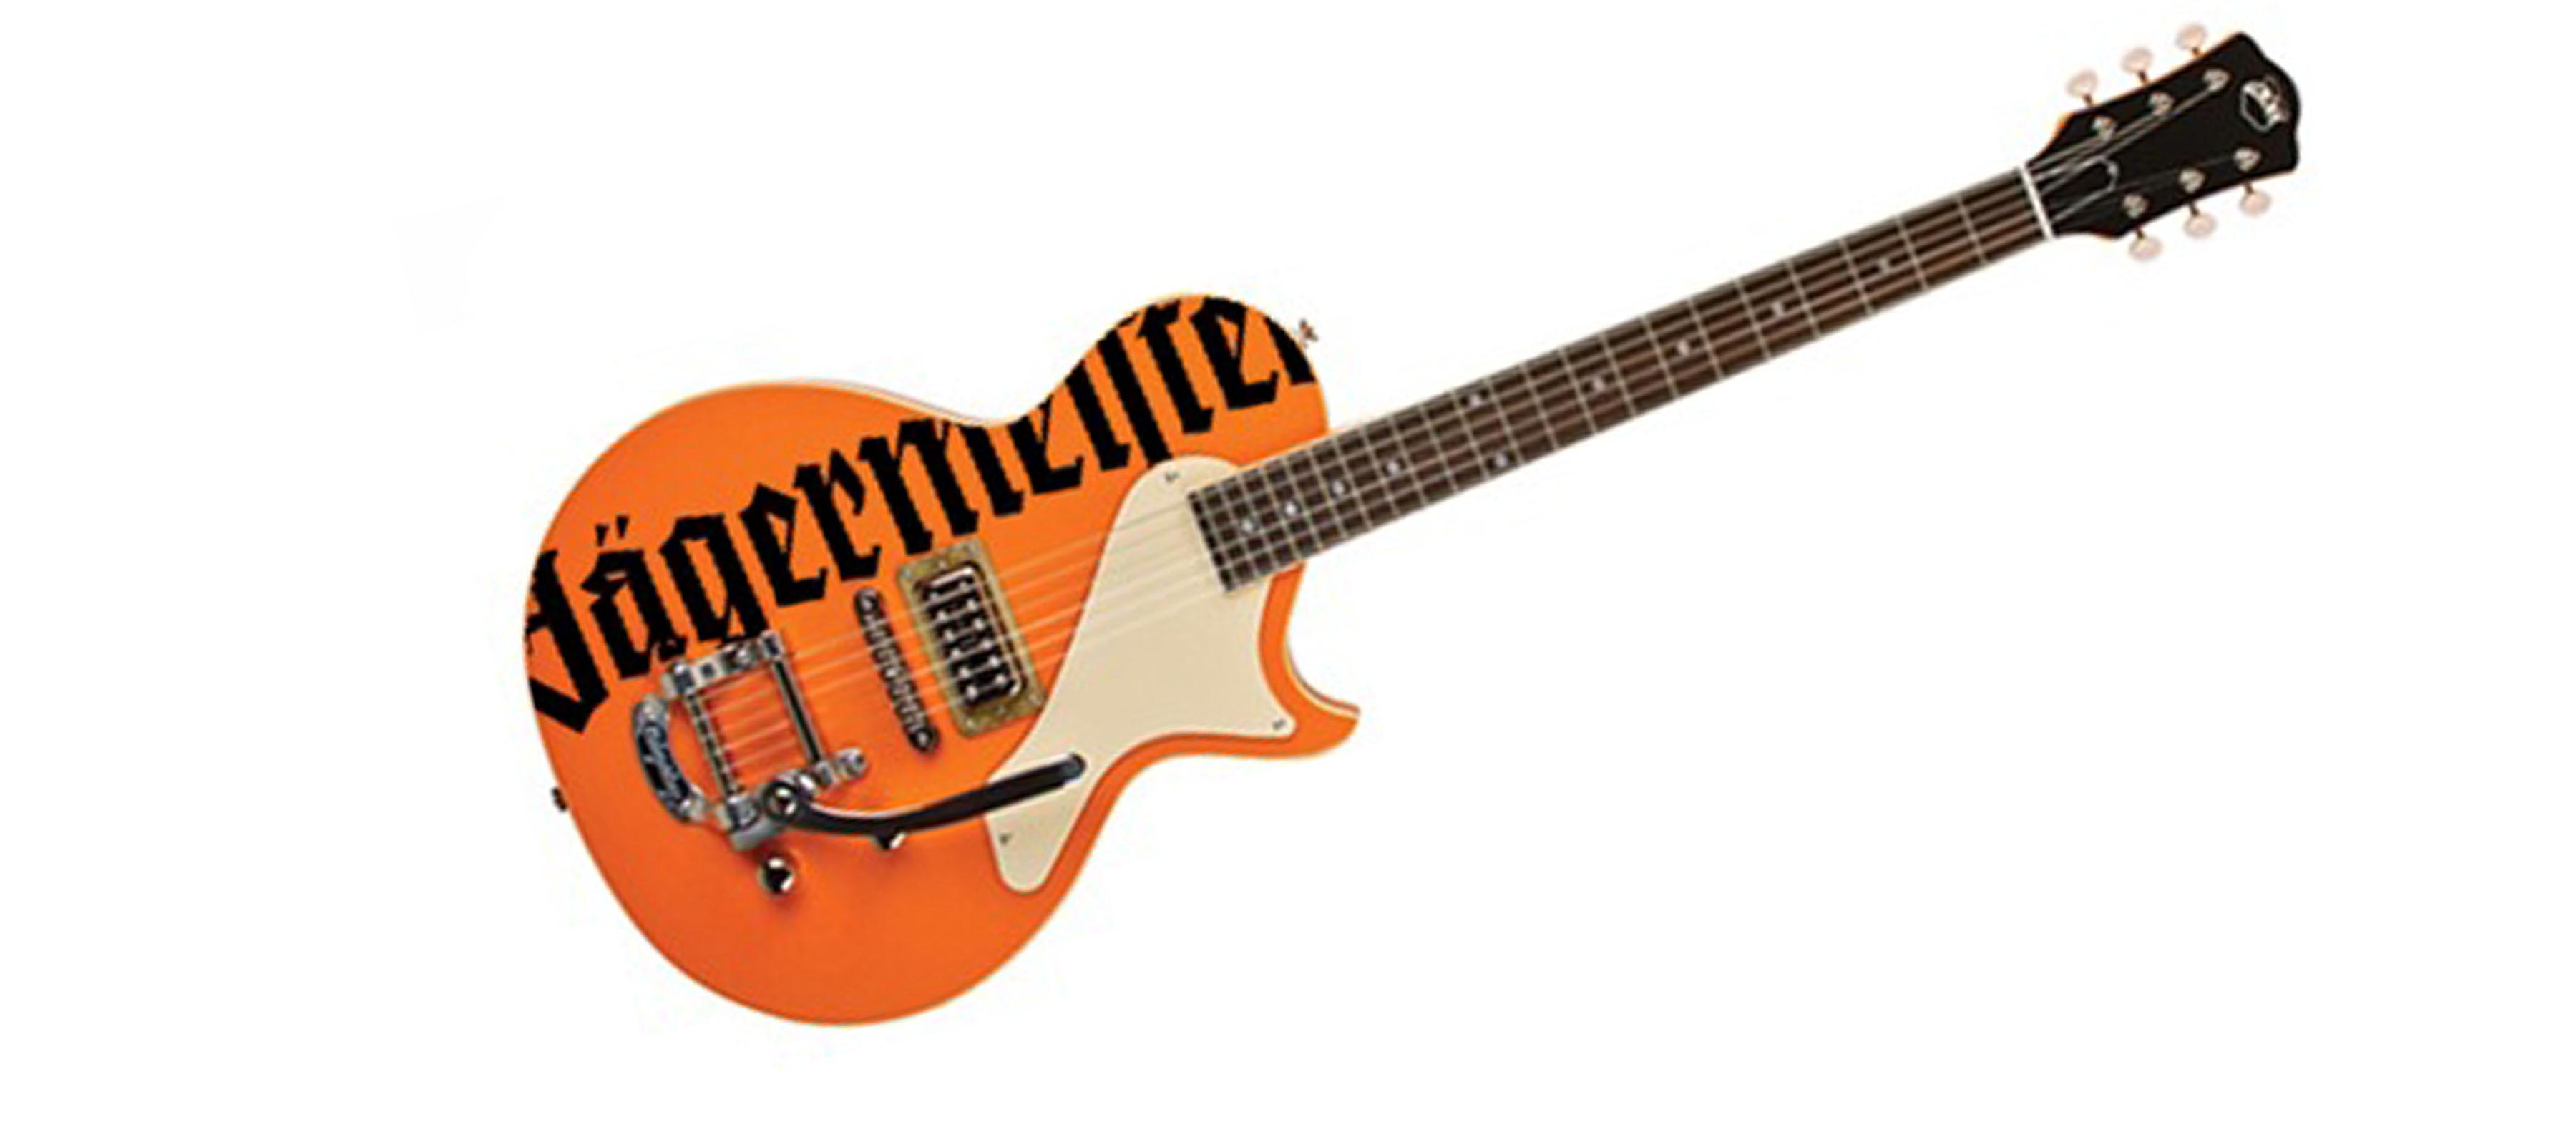 jager guitar